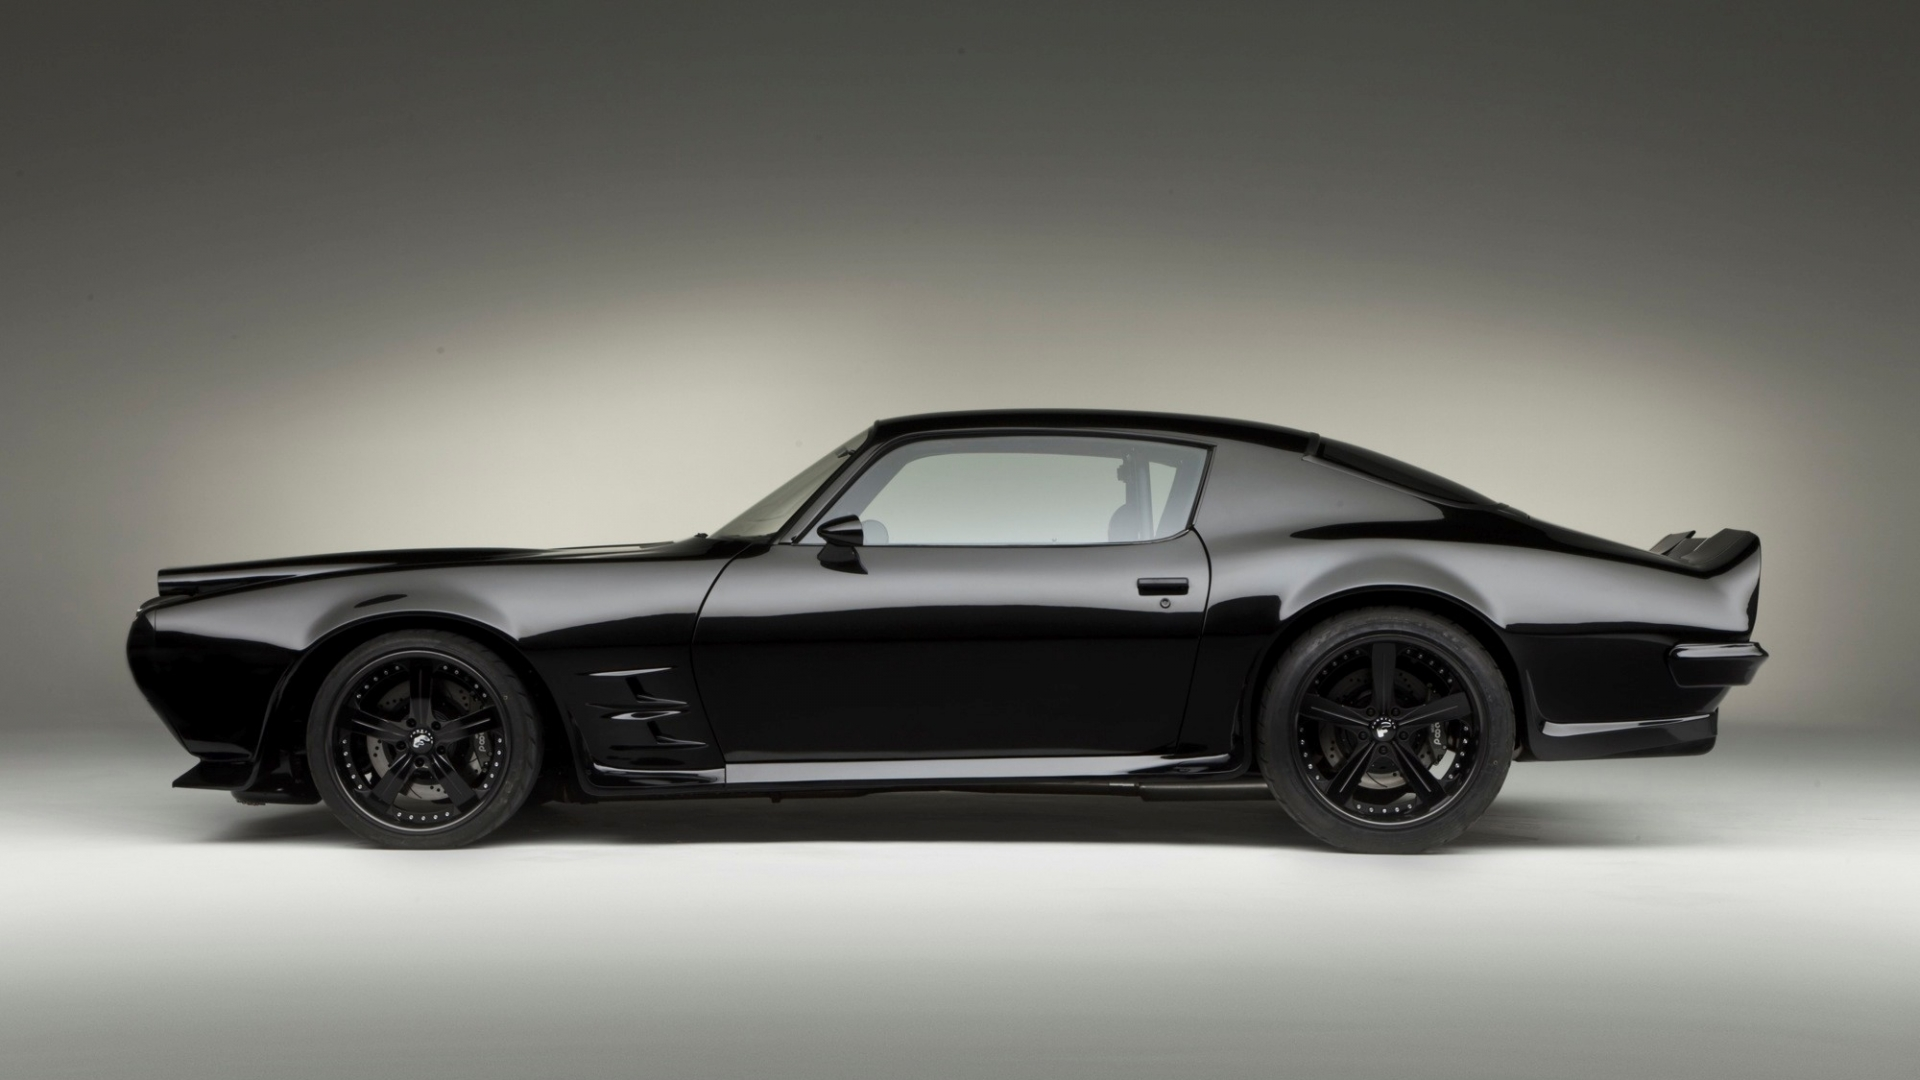 Black Cars Sports Cars Pontiac Firebird Customized Muscle Car